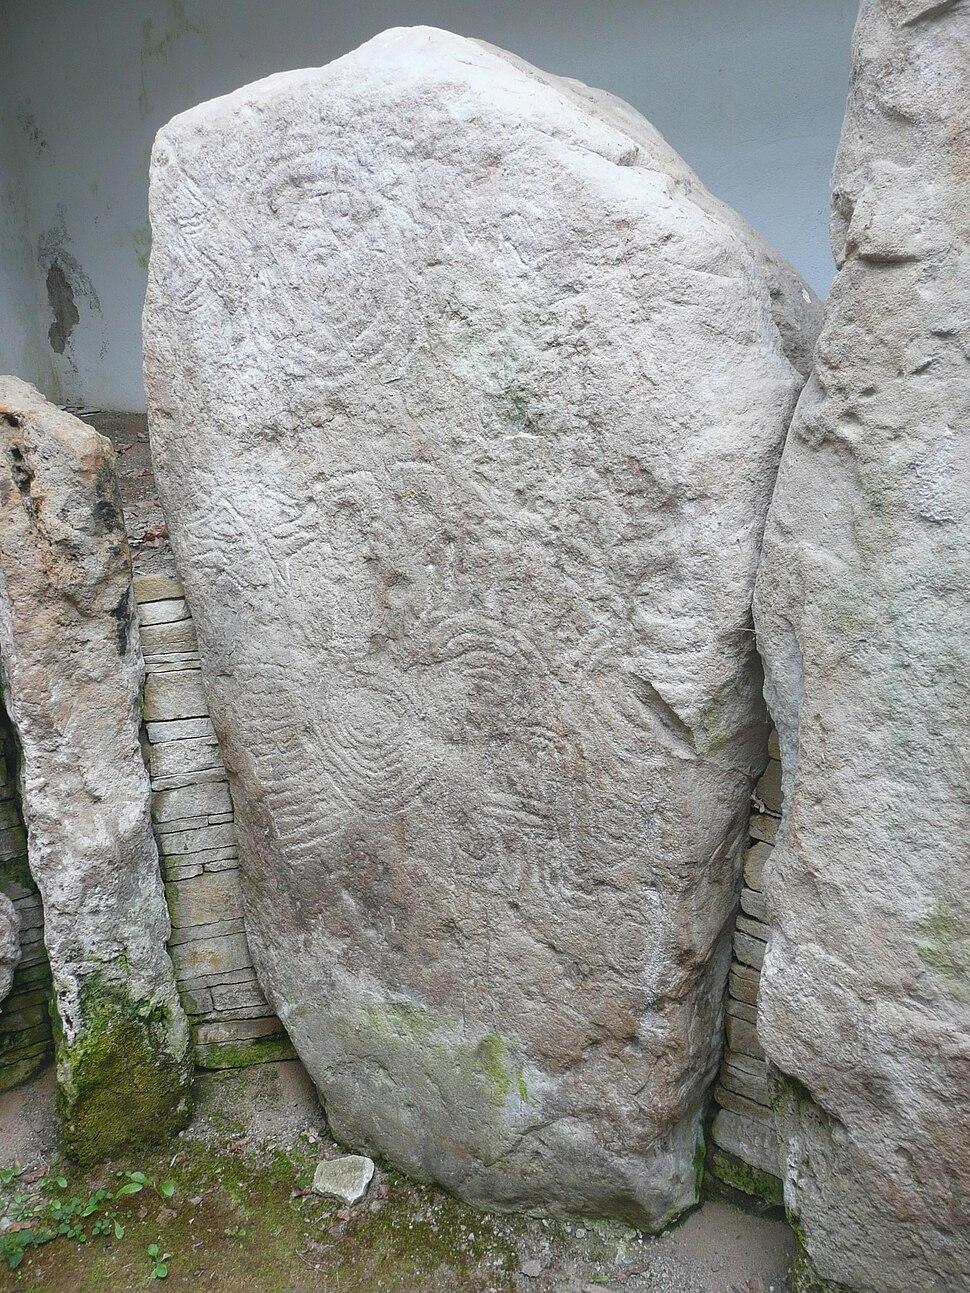 Knockmany Chambered Tomb, Co. Tyrone, Northern Ireland left